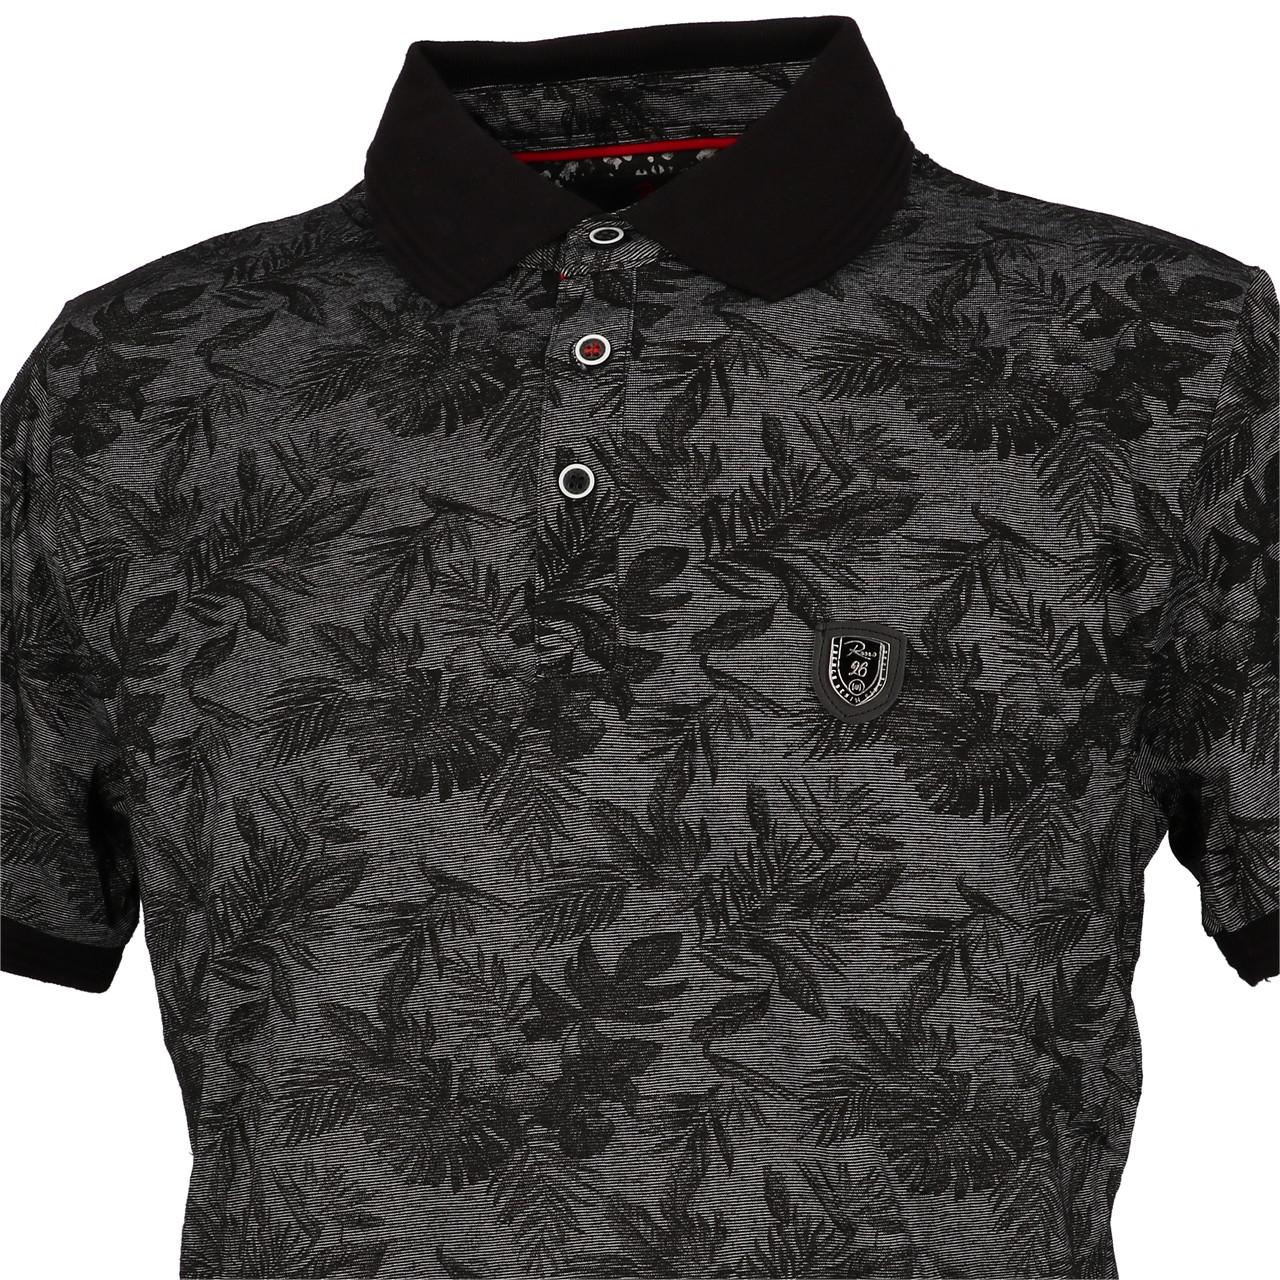 Short-Sleeve-Polo-RMS-26-Tropical-Black-Mc-Polo-Black-90730-New thumbnail 2